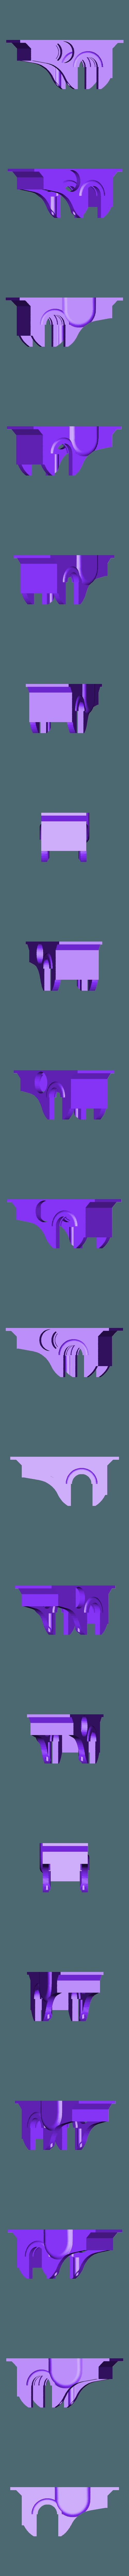 Truck_V4_Centerdiff_CasingA.STL Download STL file 3D Printed Rc Truck V4 • 3D printable template, MrCrankyface